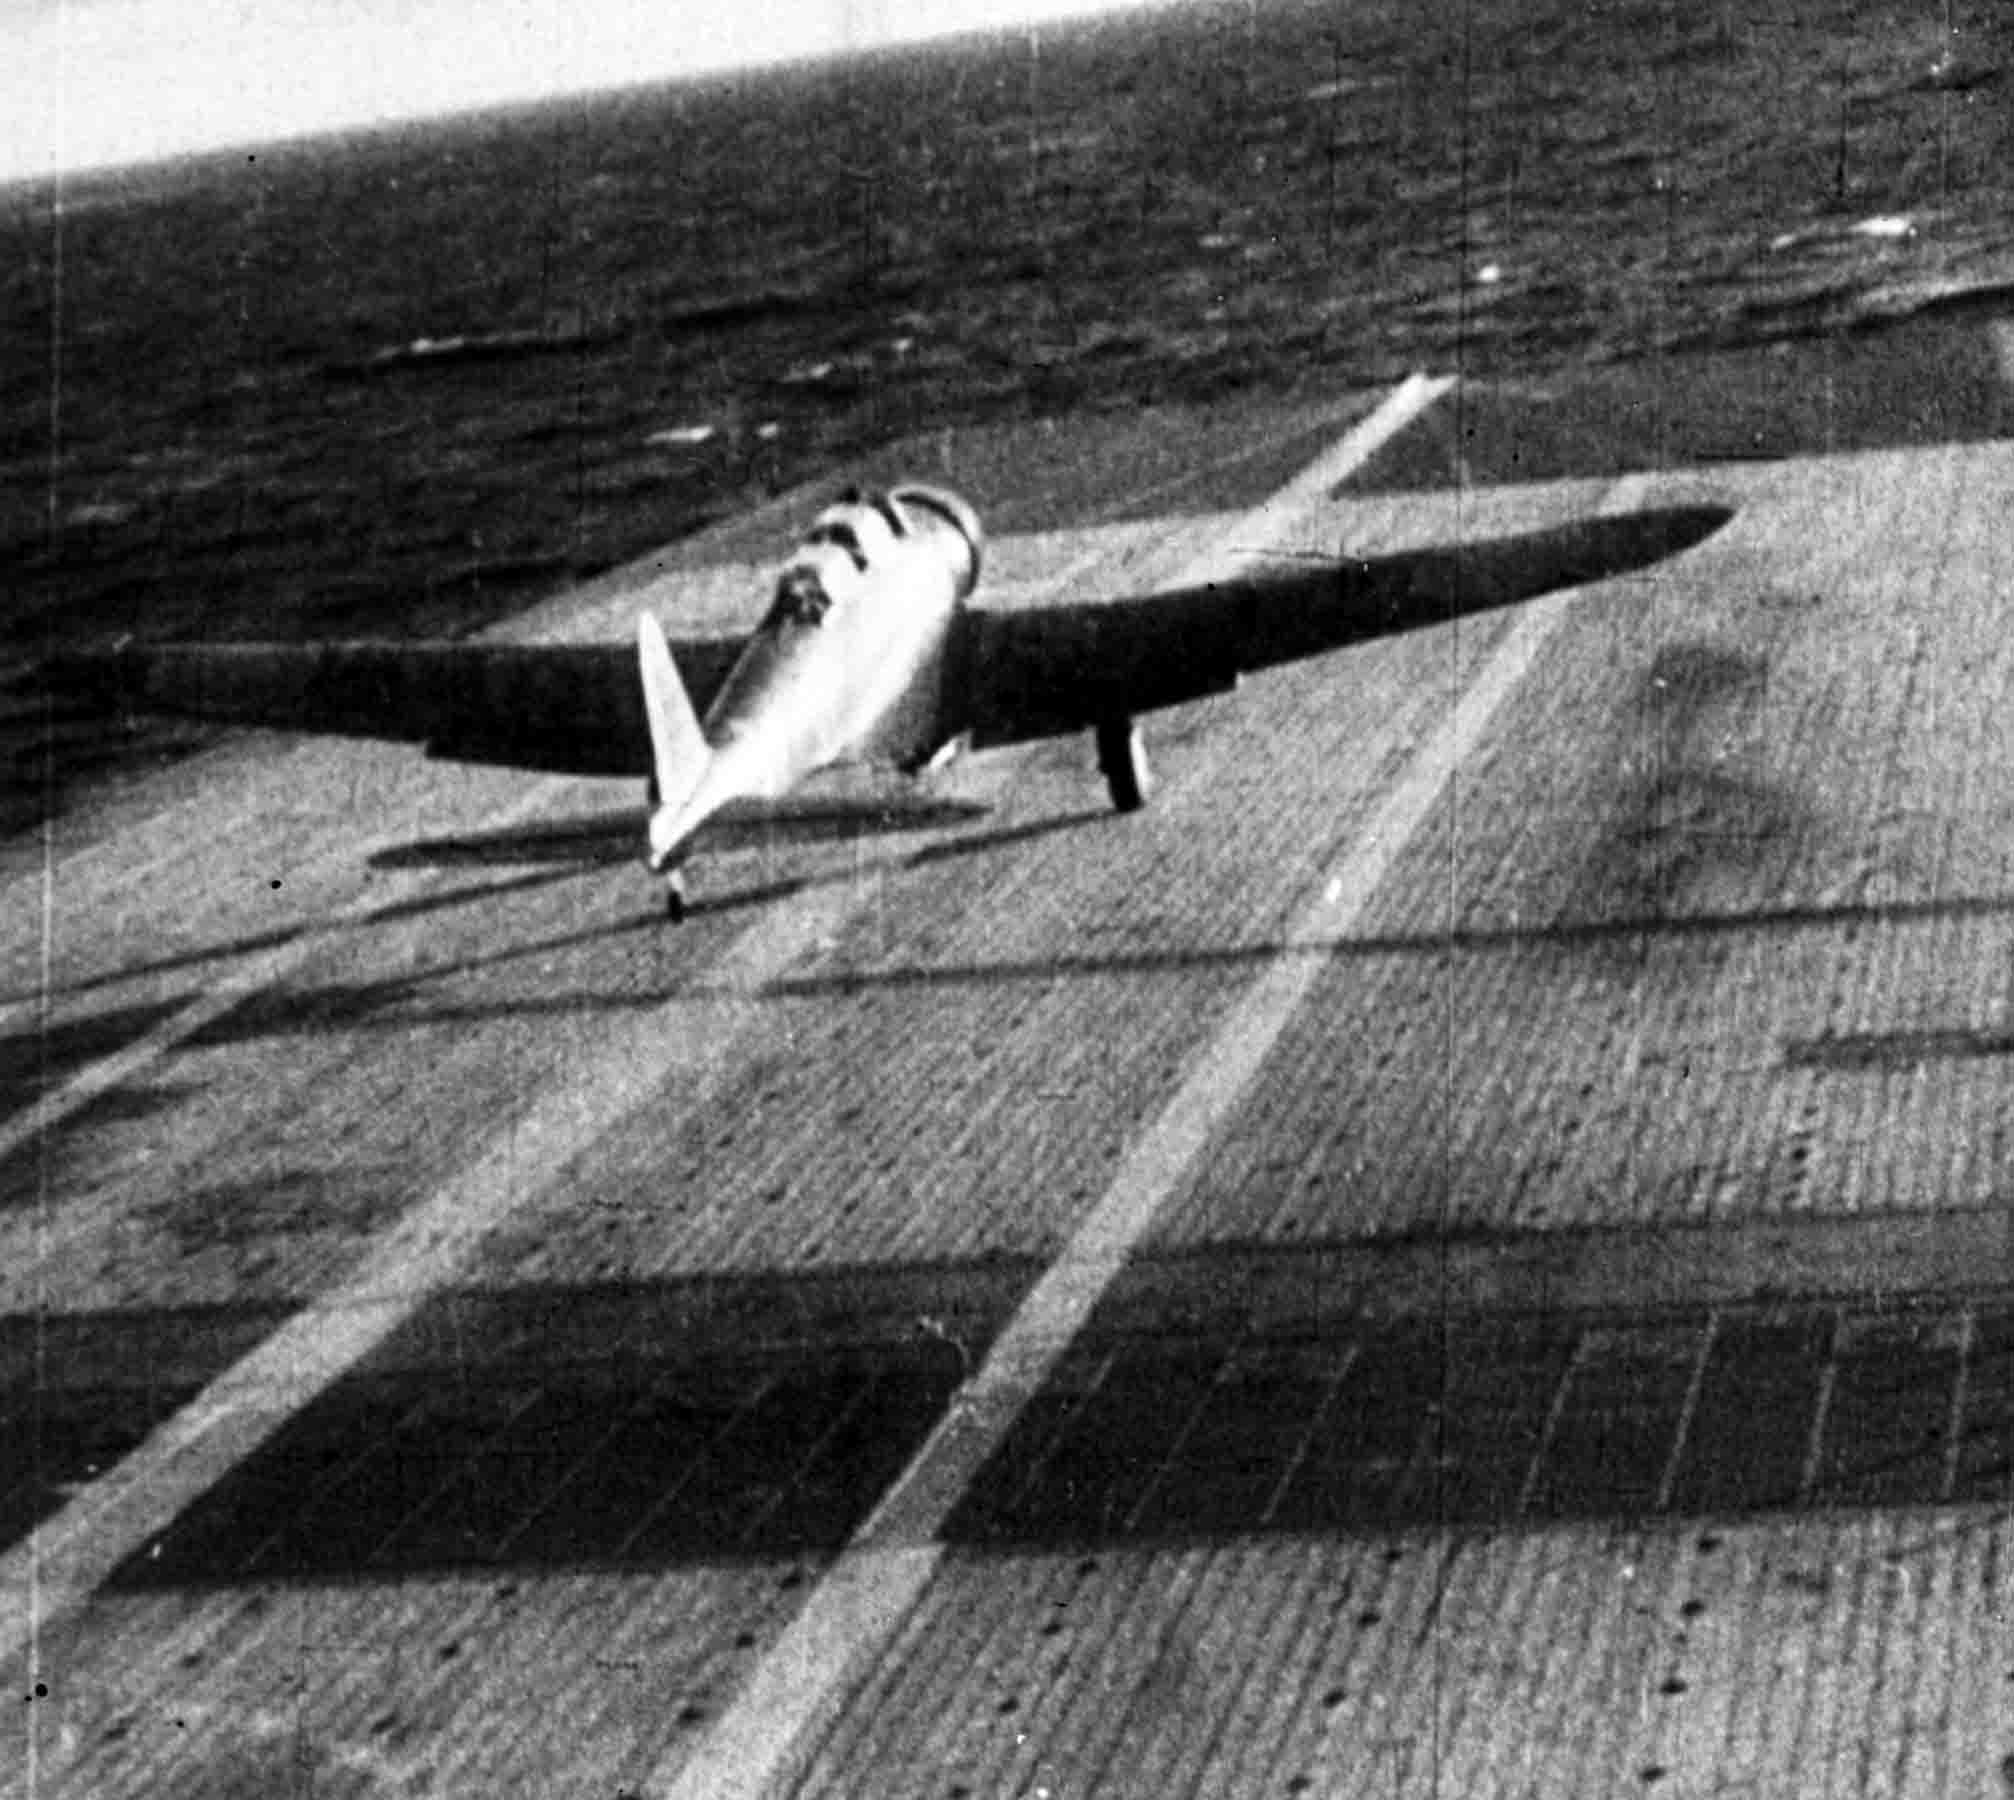 Nakajima B5N, JNAF taking off from carrier